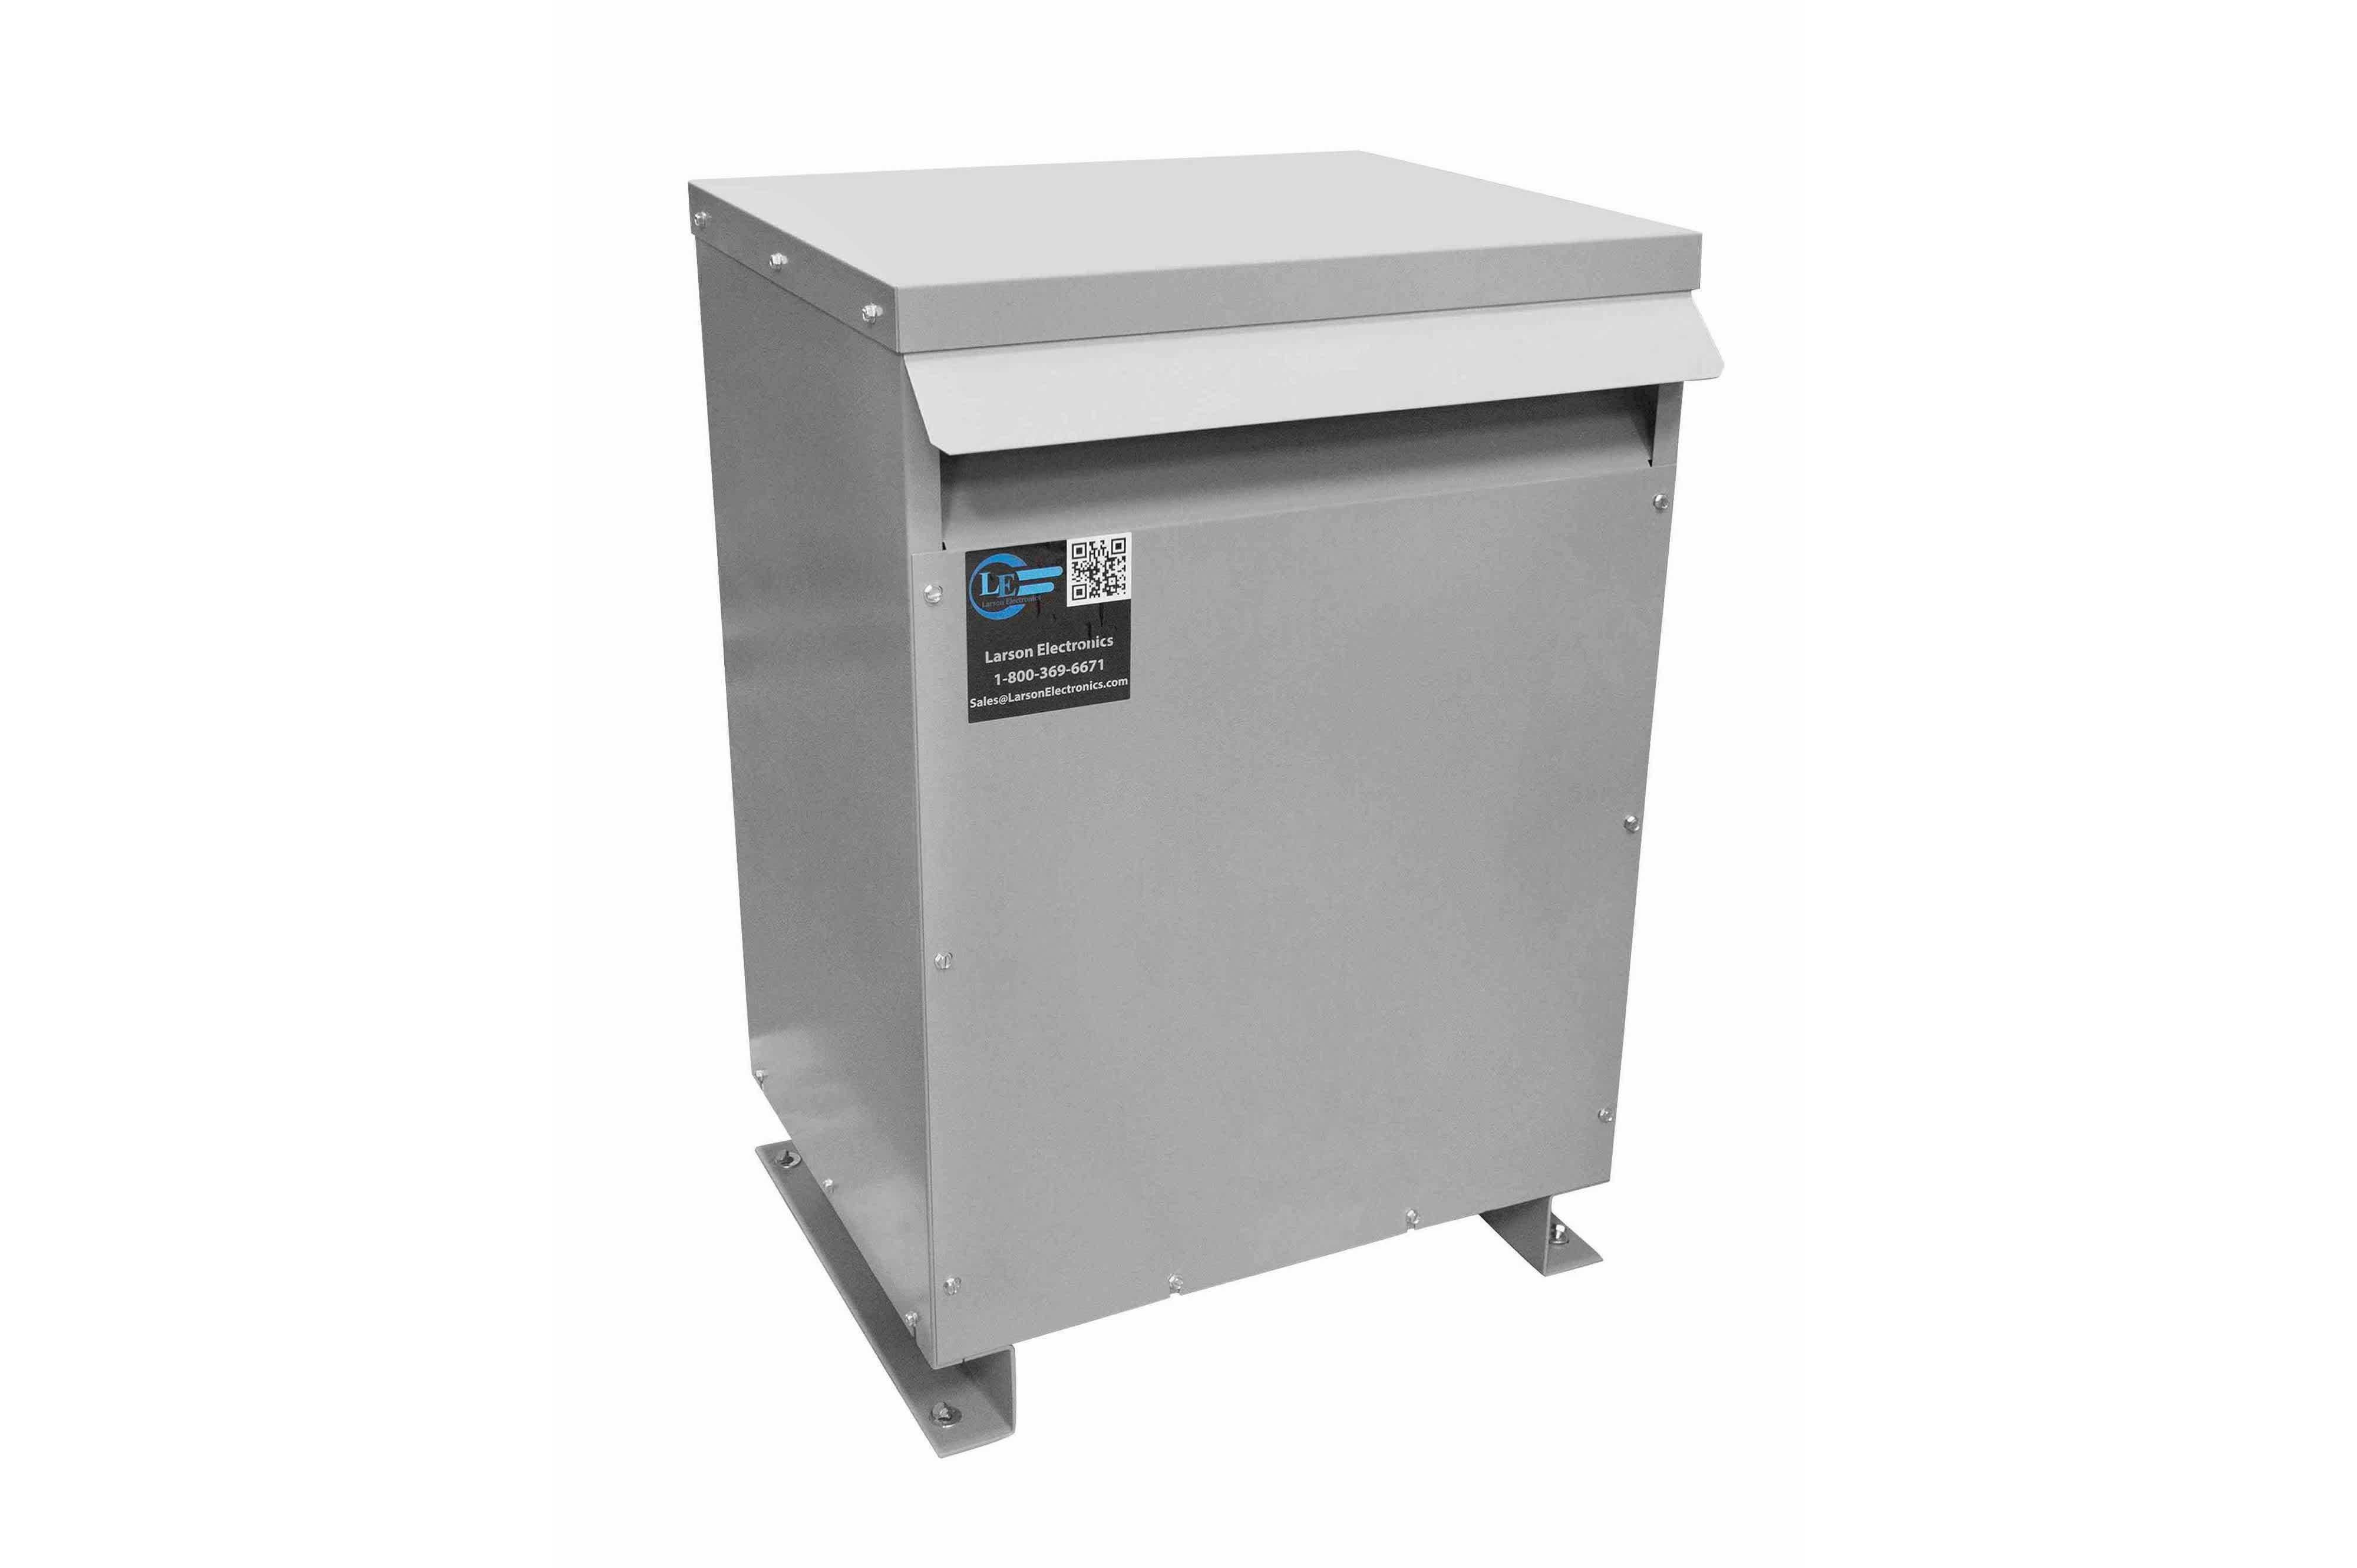 28 kVA 3PH DOE Transformer, 380V Delta Primary, 208Y/120 Wye-N Secondary, N3R, Ventilated, 60 Hz